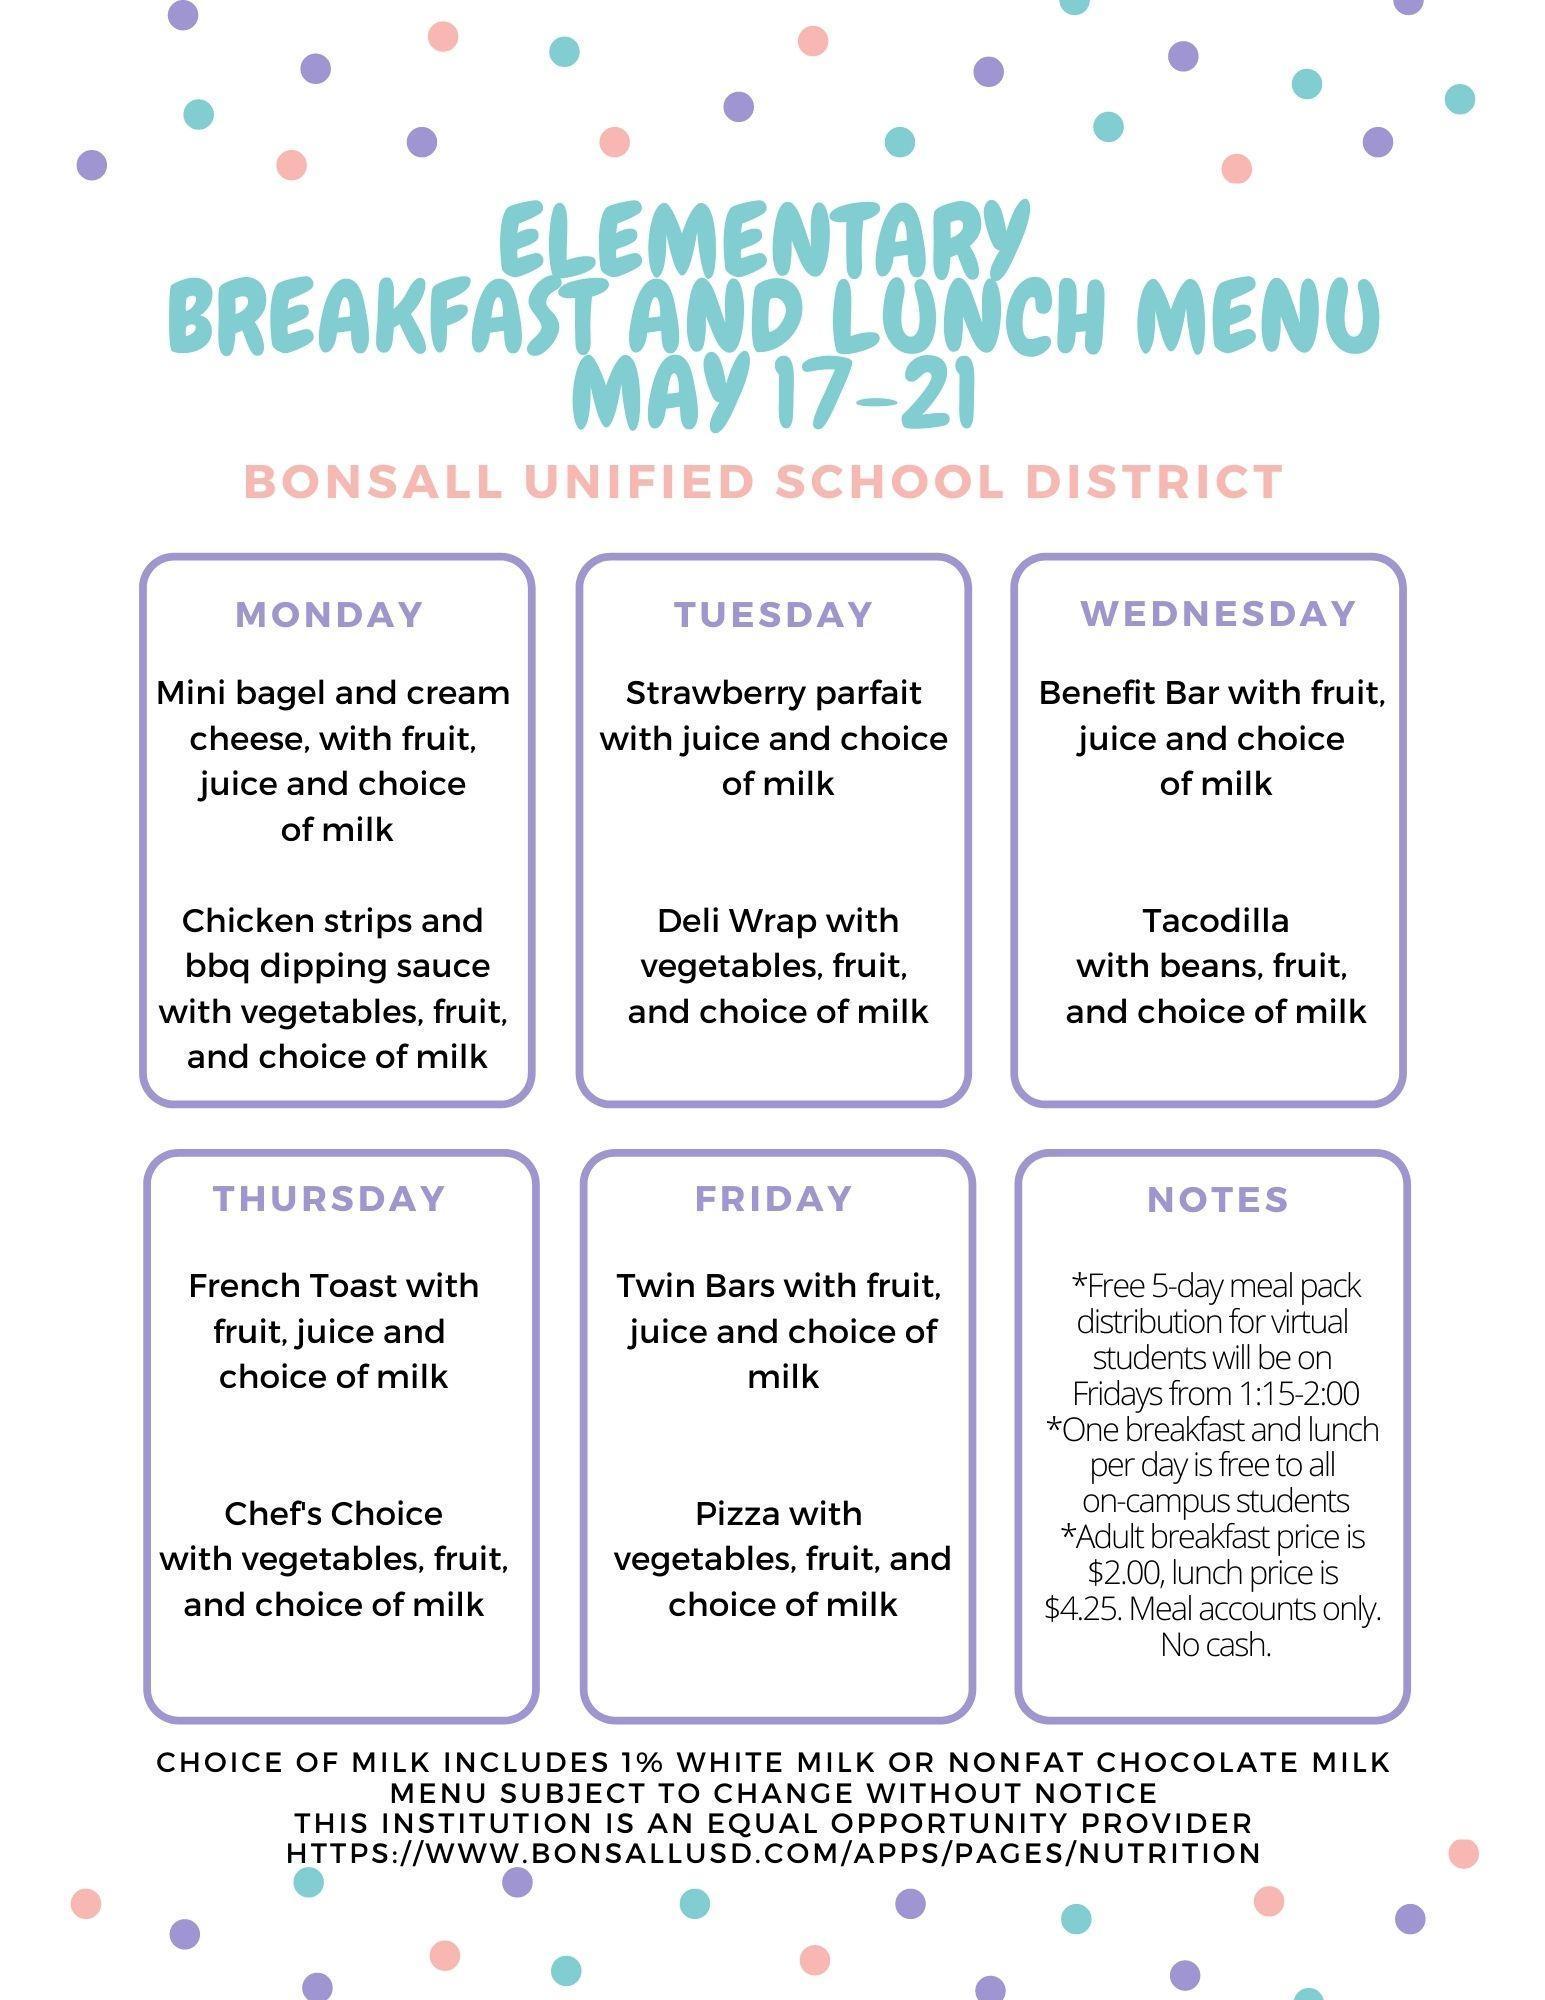 Elementary menu